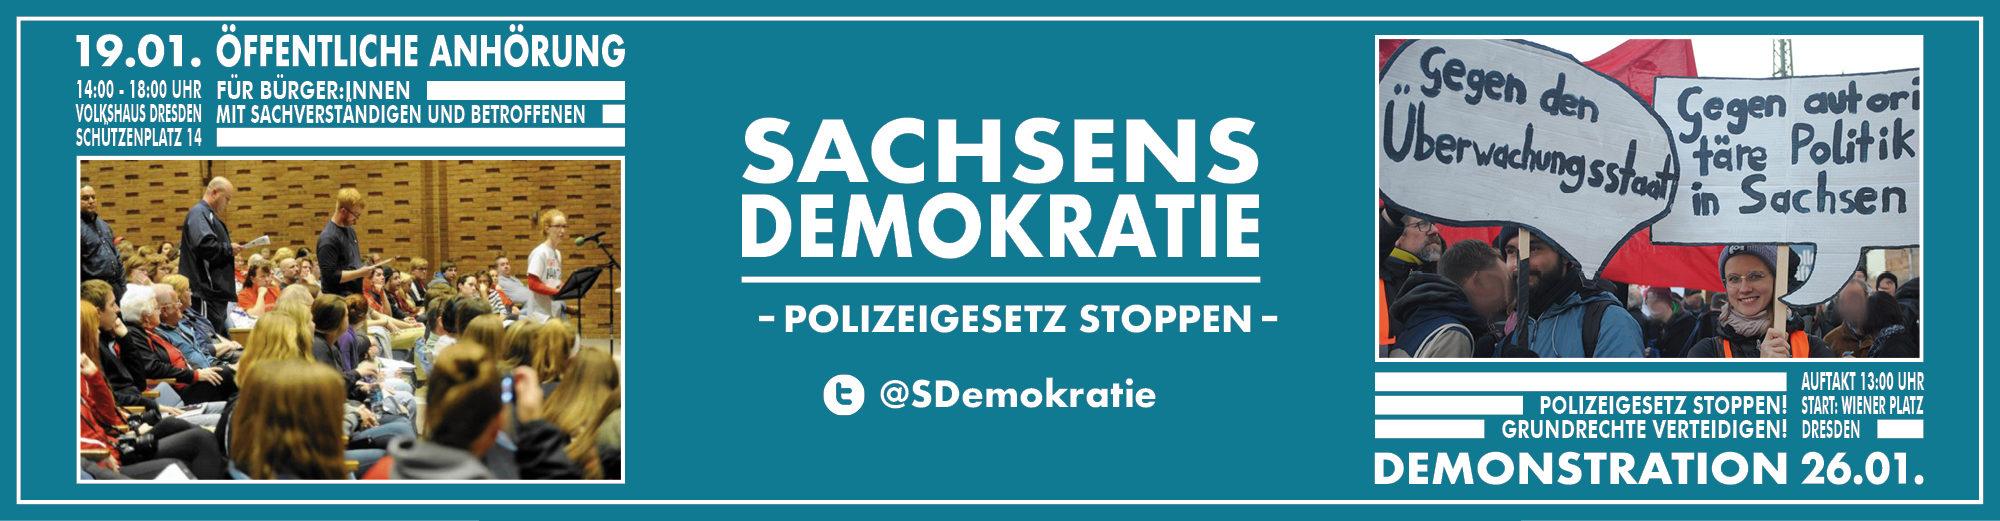 Sachsens Demokratie